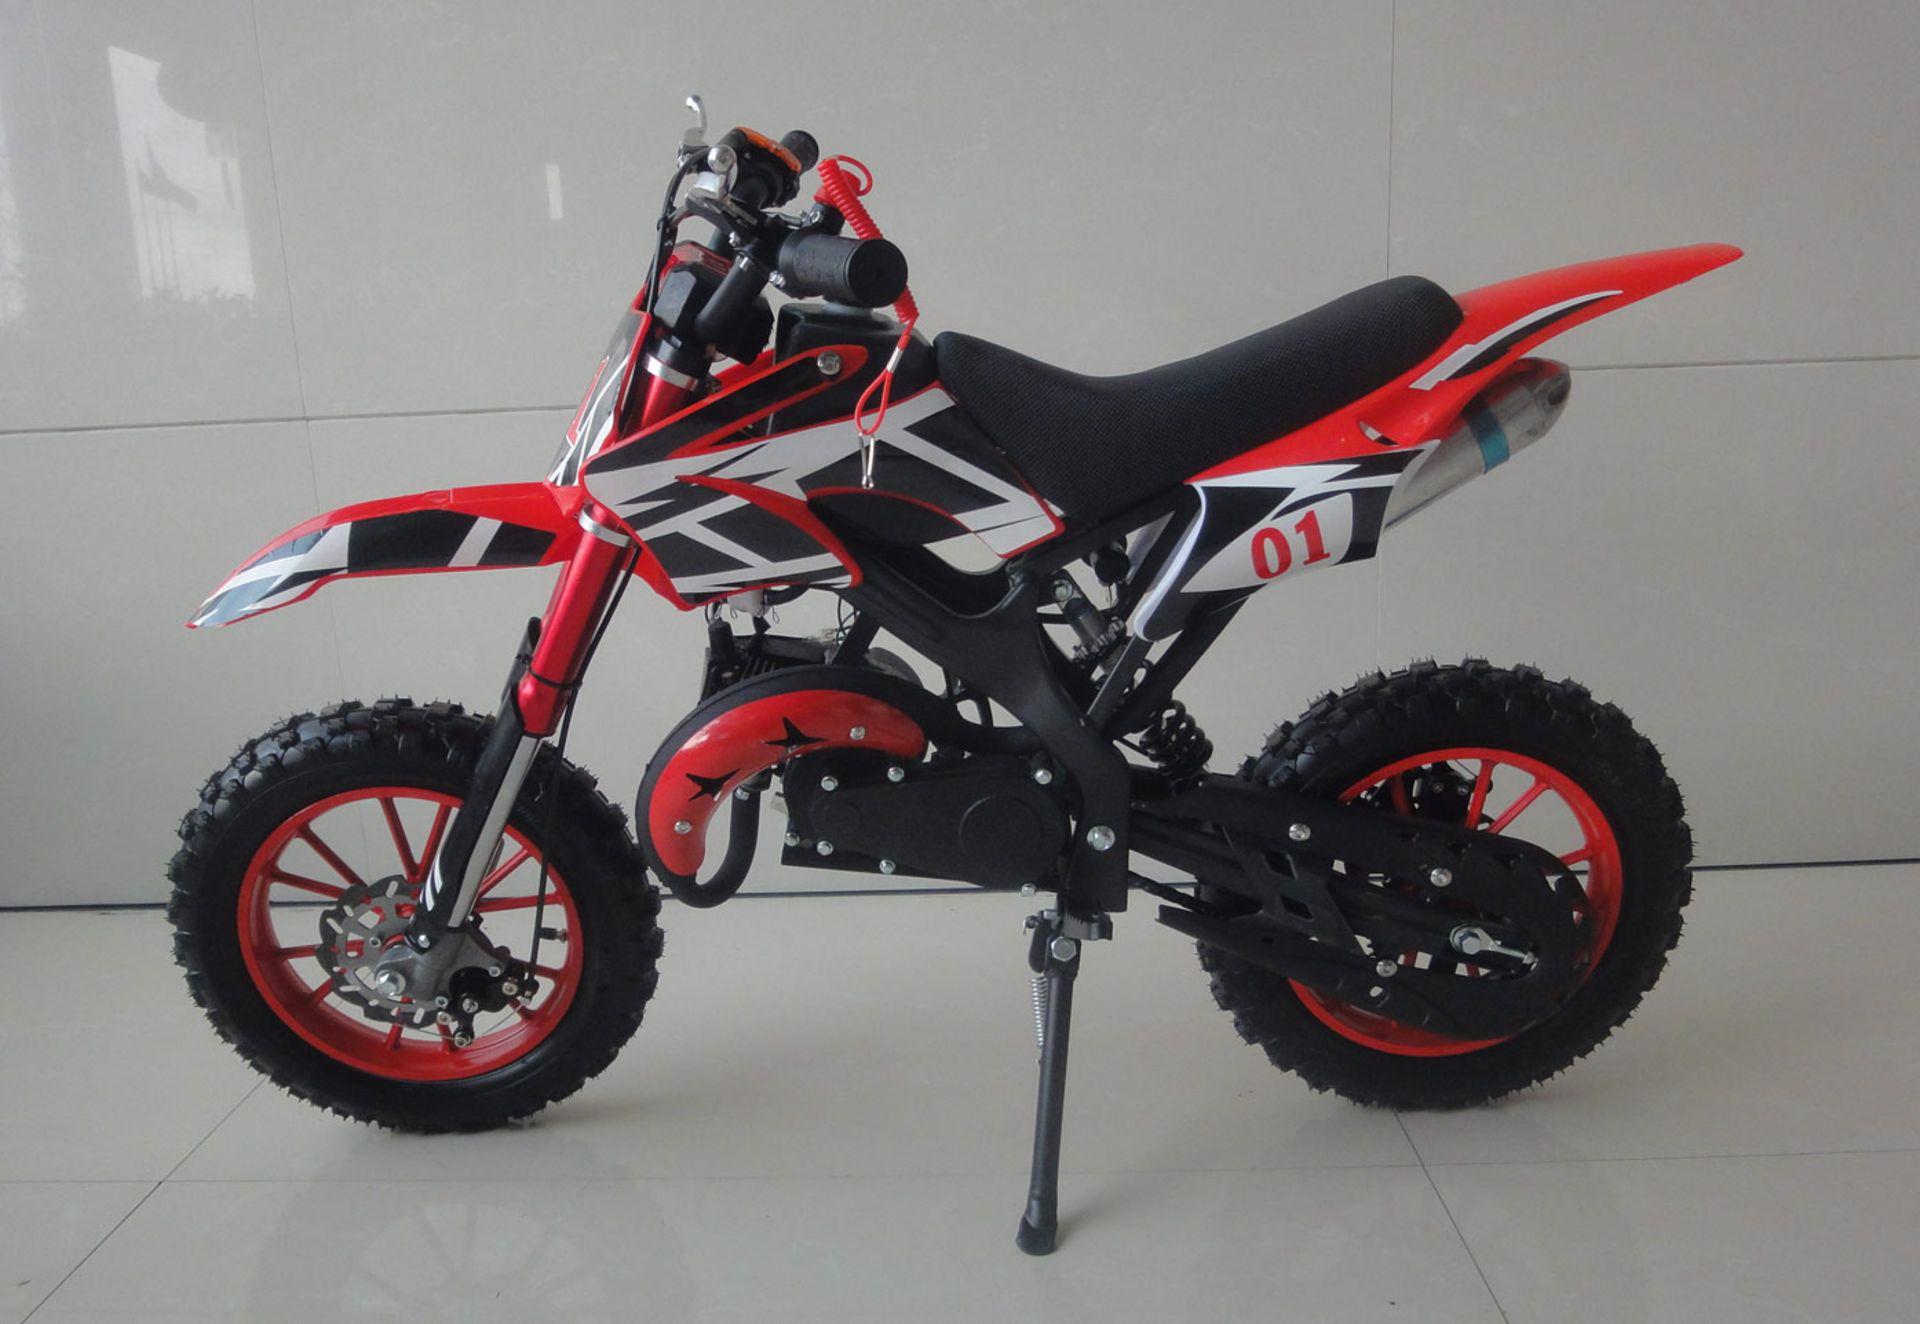 + VAT Brand New 49cc Falcon Mini Dirt Bike - Full Front & Rear Suspension - Disc Brakes - Easy Pull - Image 4 of 6